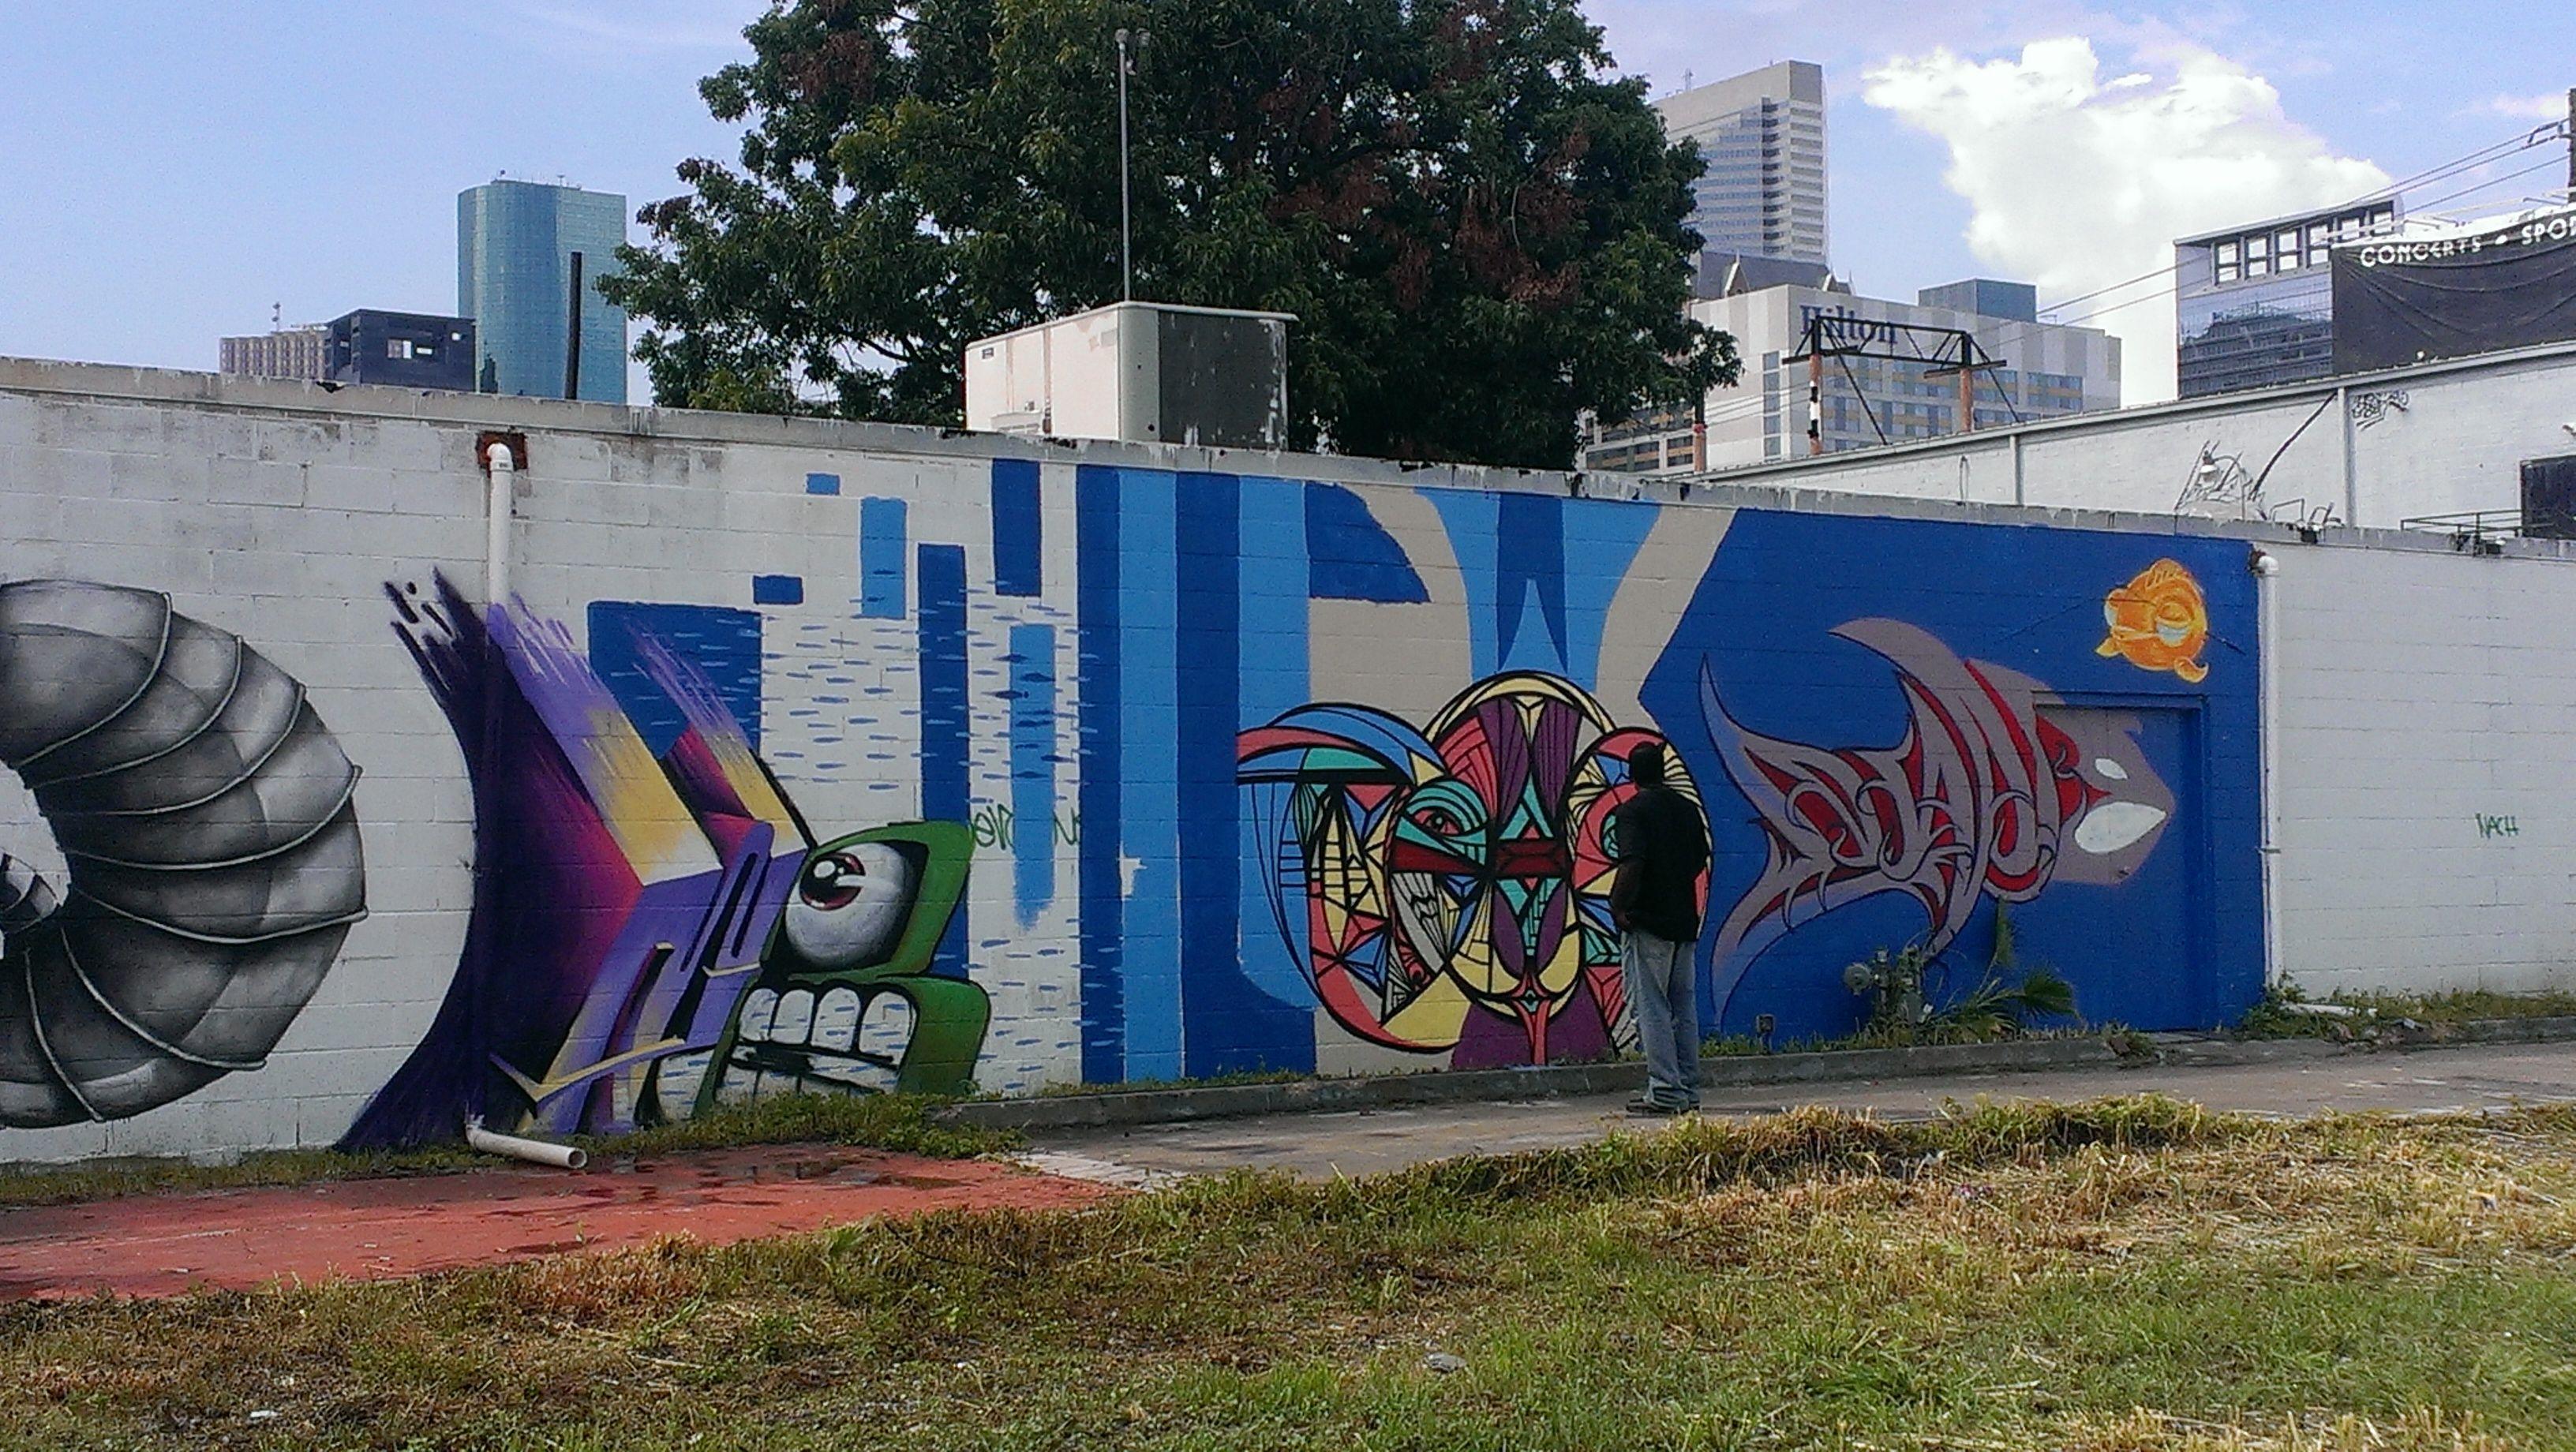 Houston street art collage multiple artists shared the